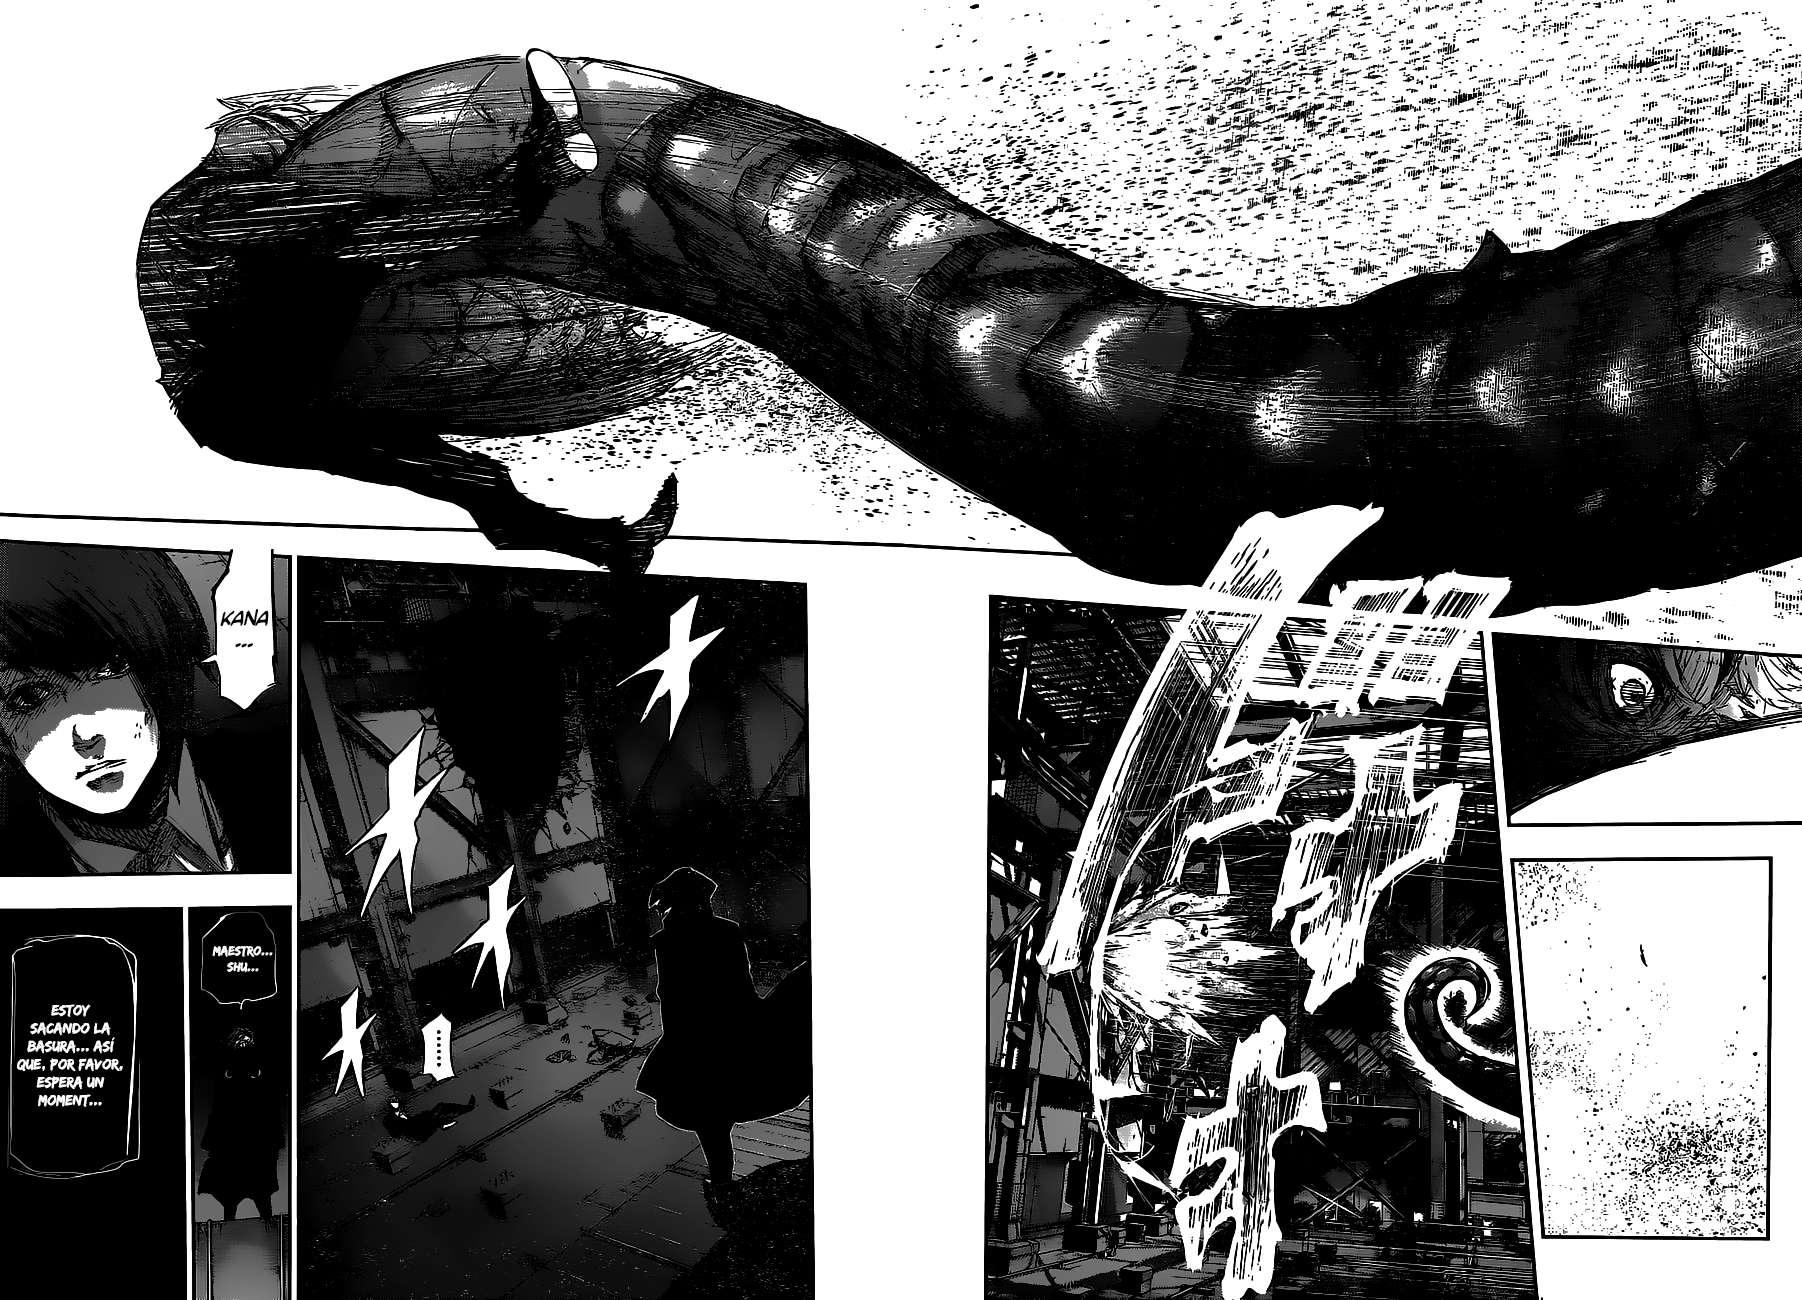 http://c5.ninemanga.com/es_manga/59/59/424182/4198f9d67624156e01306d74490fff41.jpg Page 6